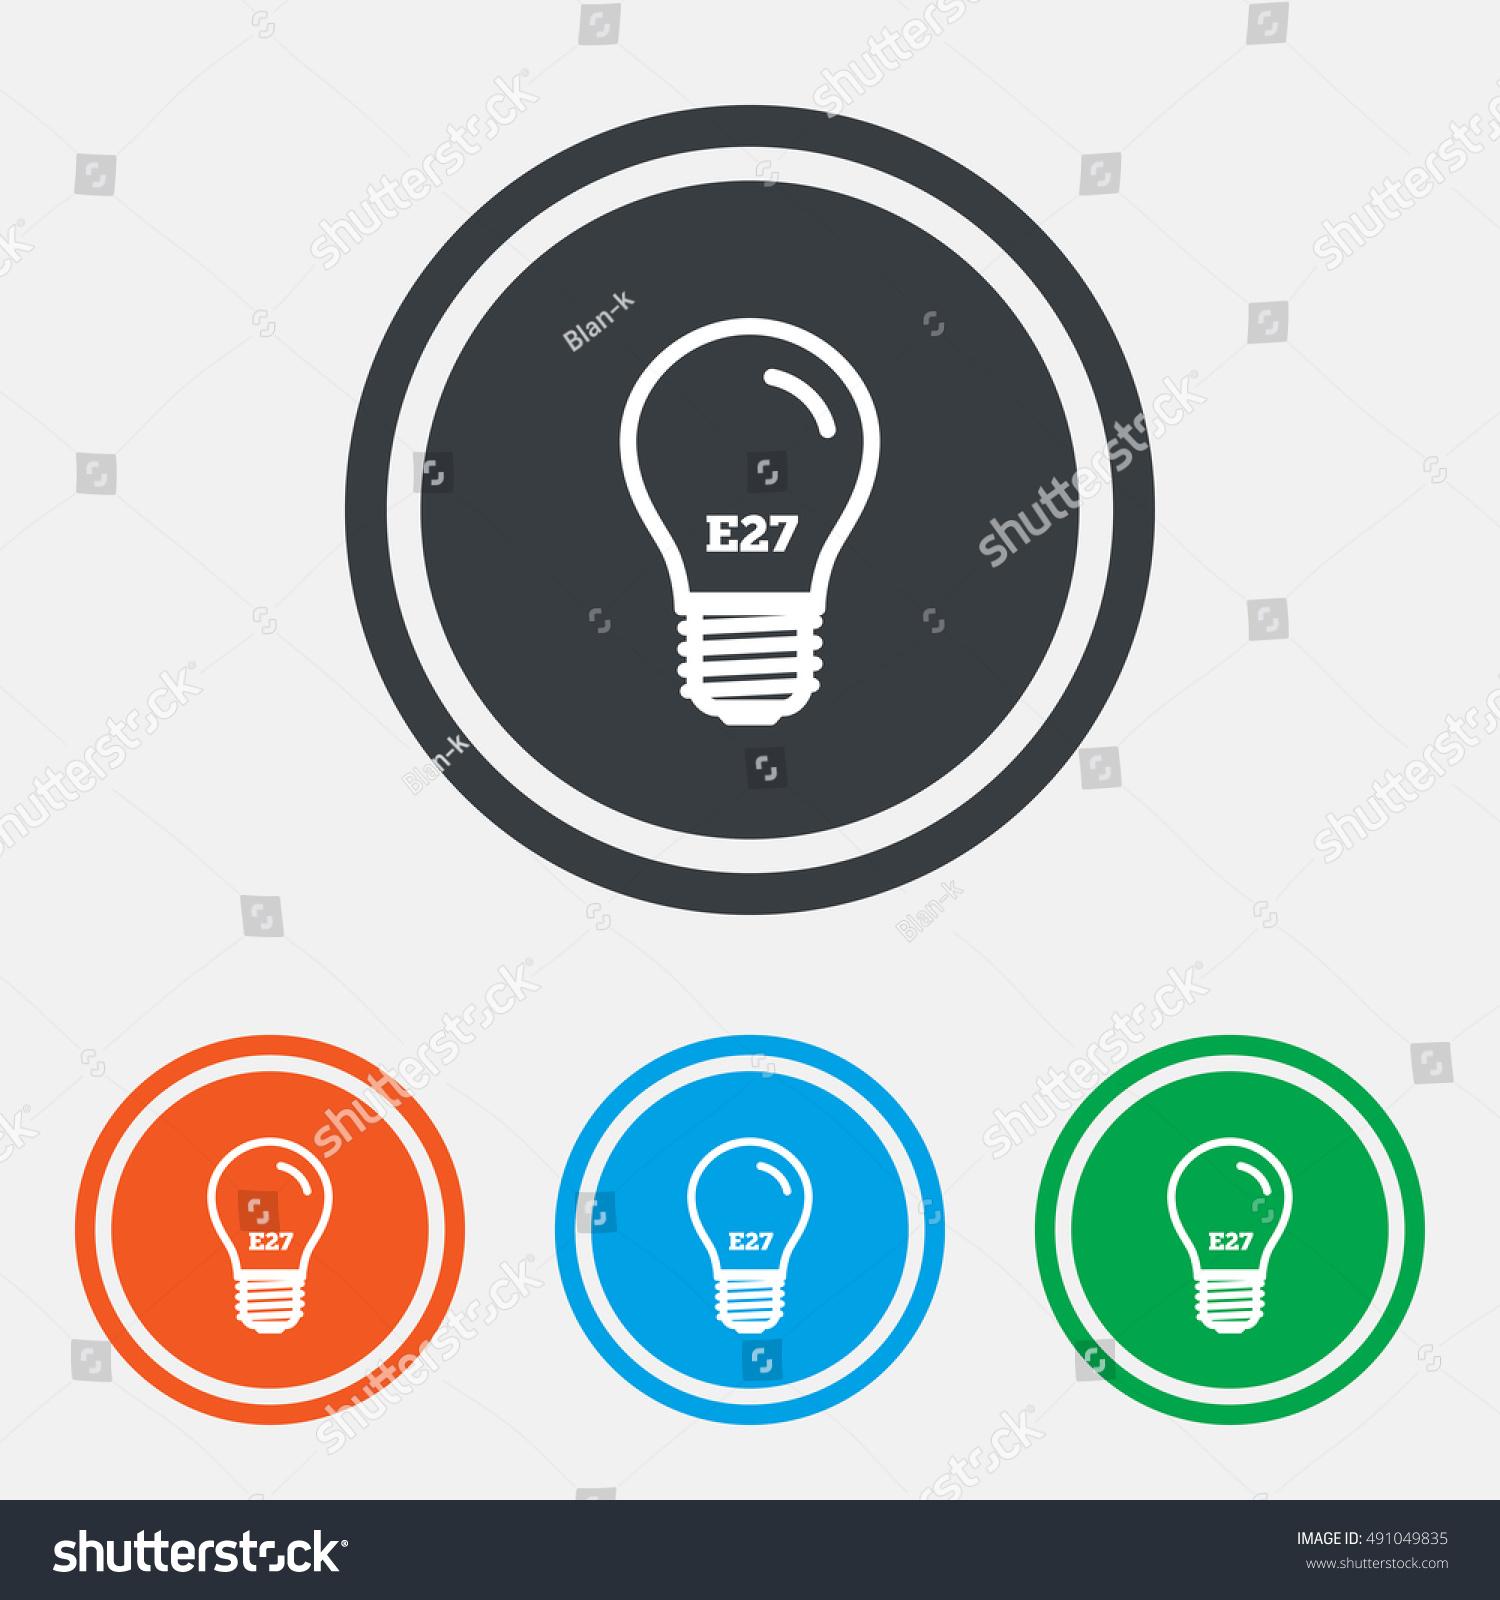 Unique Symbol For Led Light Gallery - Wiring Diagram Ideas ...